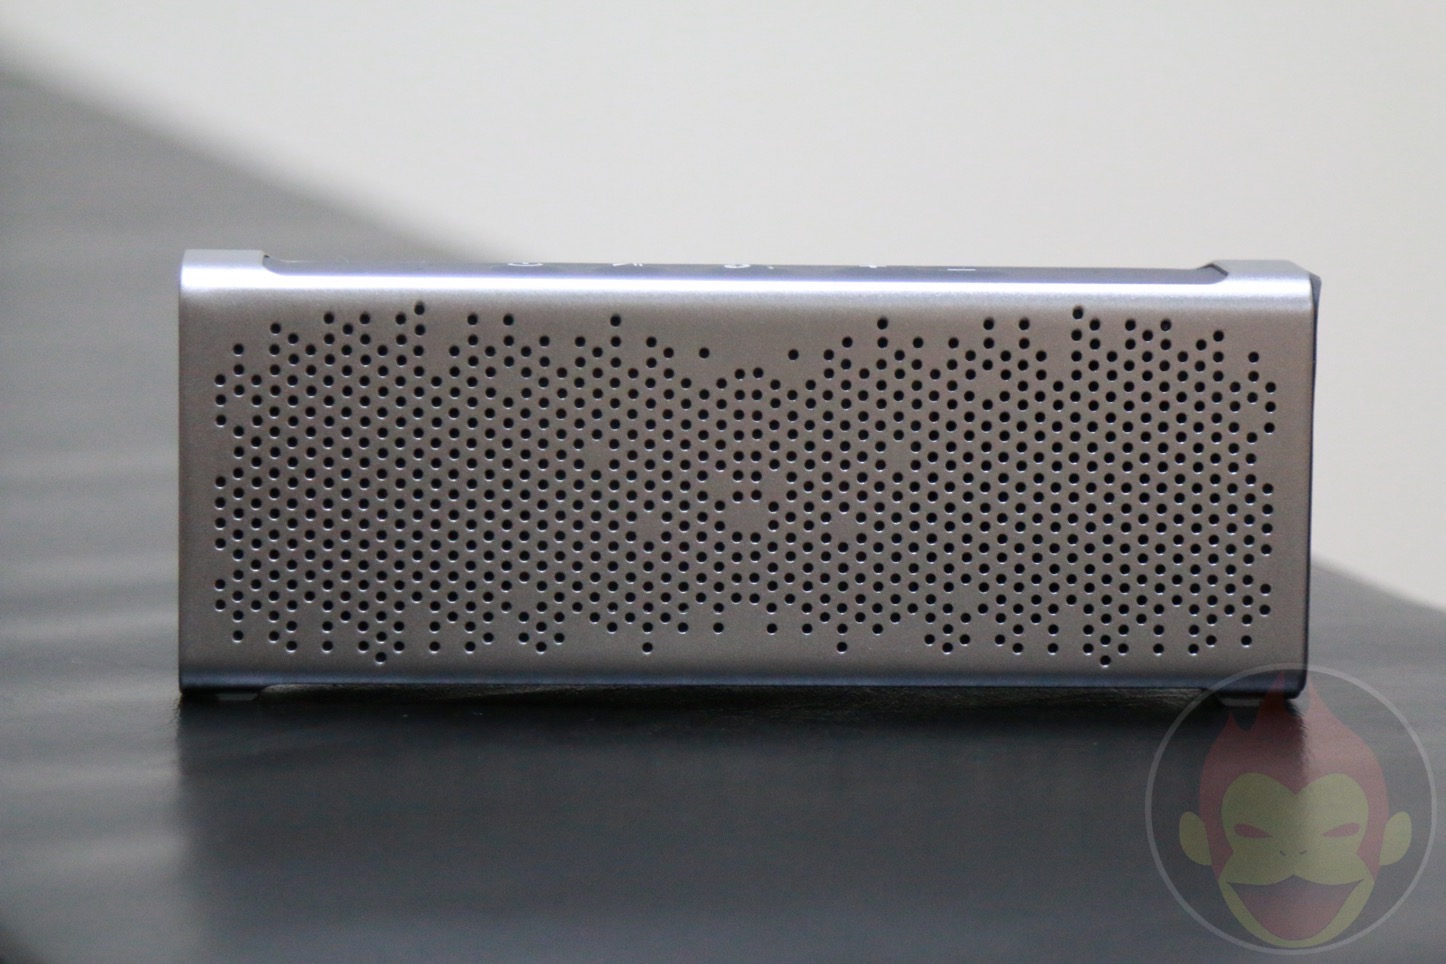 Inateck-Bluetooth-Speaker-18.JPG